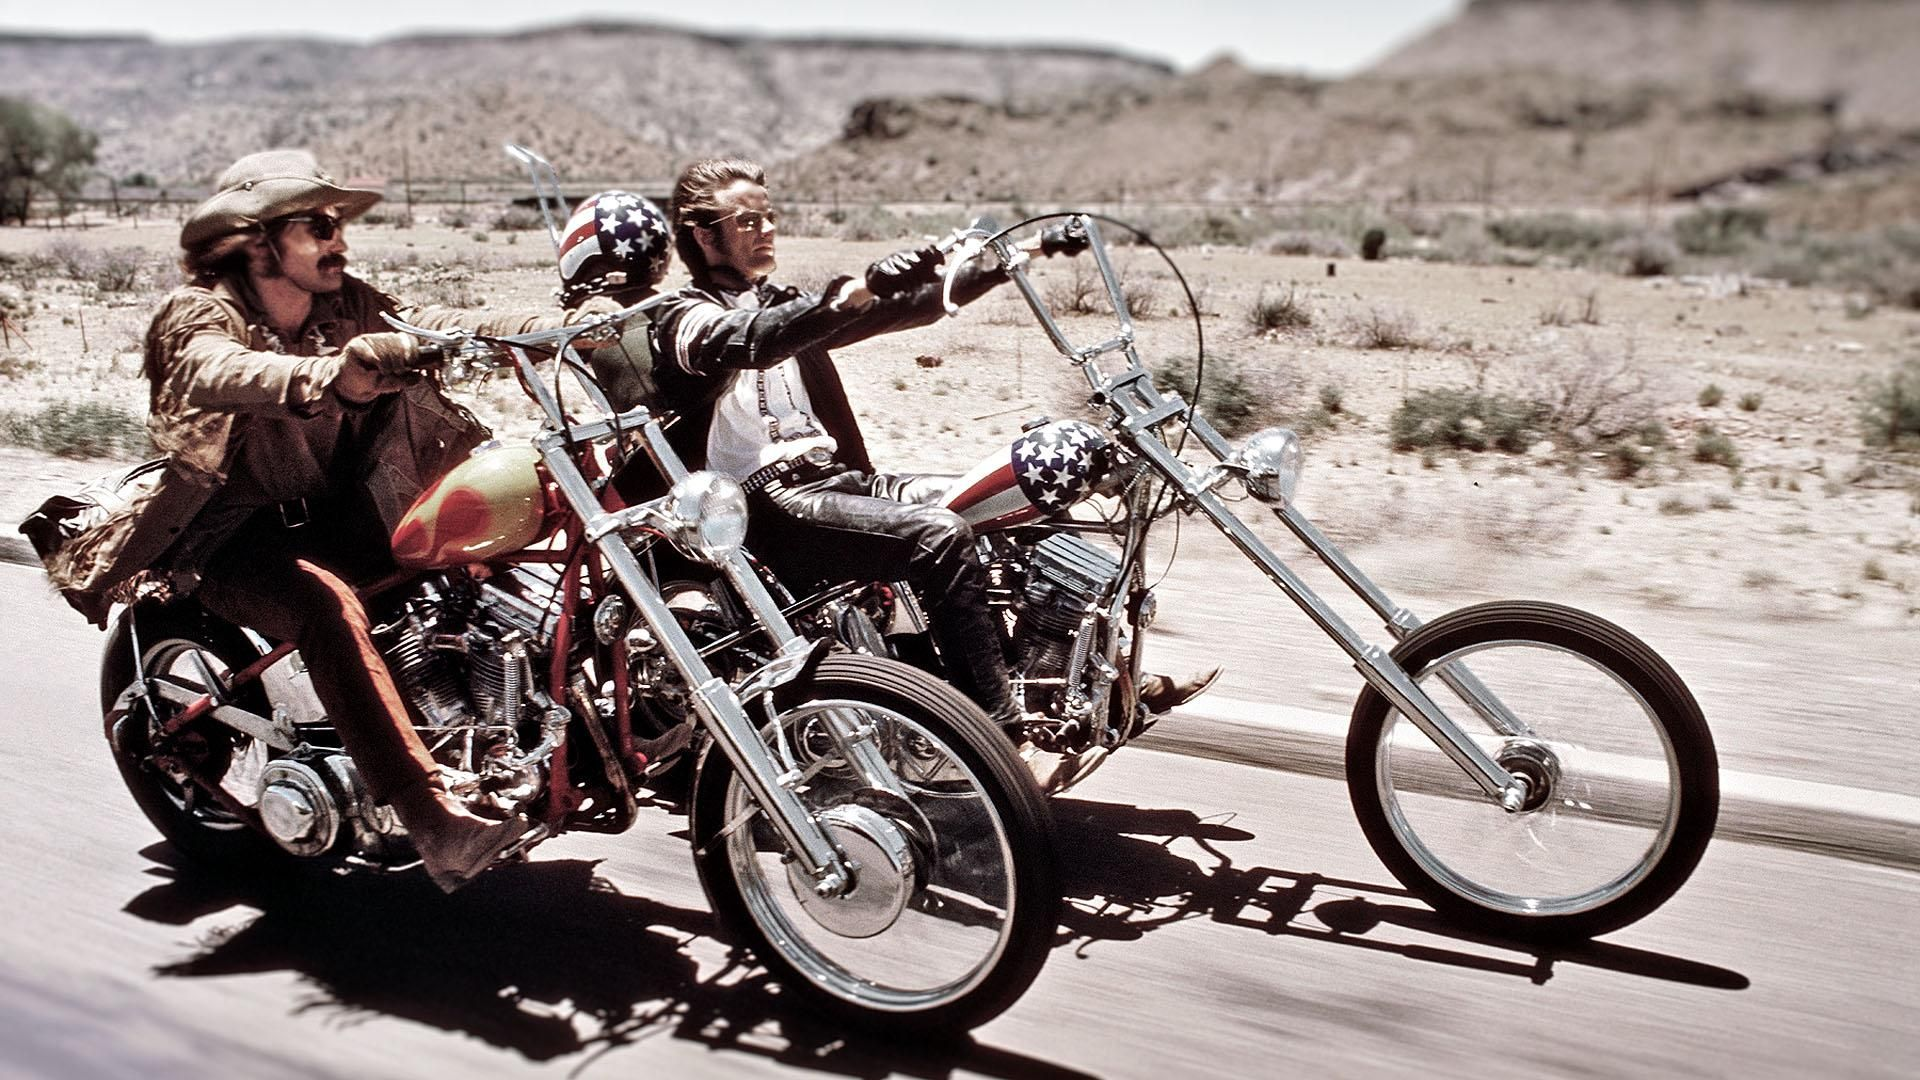 Easy Rider Qvf | Vehicles | Pinterest | Easy rider ...